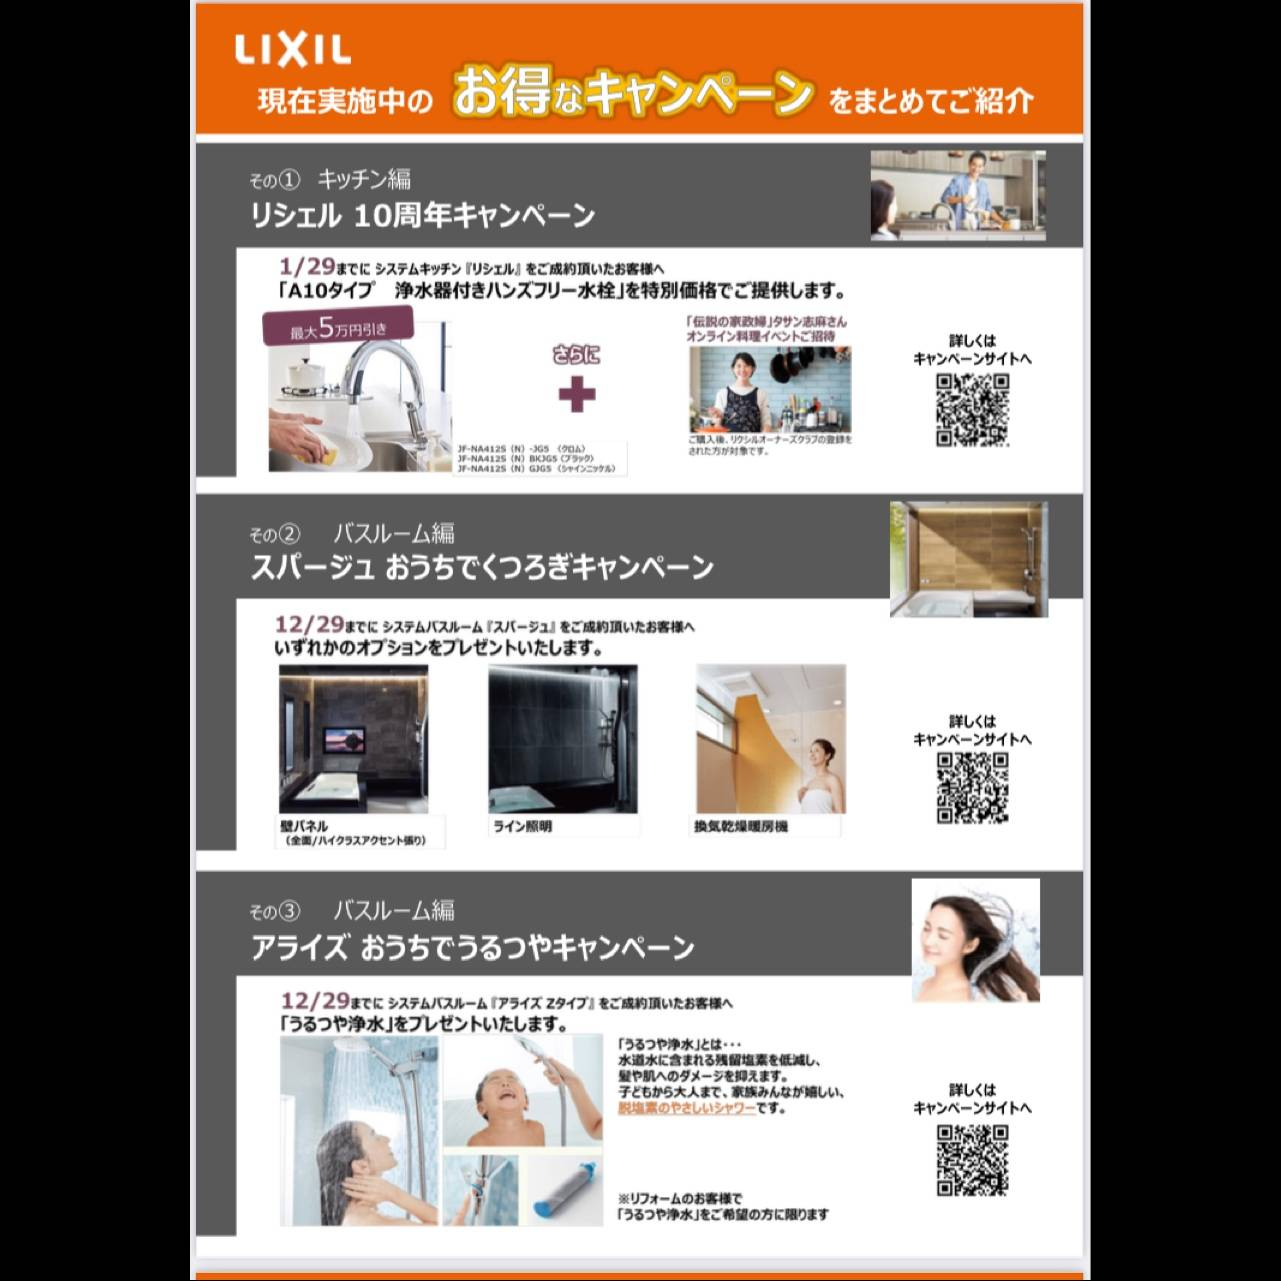 LIXIL  お得なキャンペーン  まとめてご紹介☆ 原口建材店 熊本のイベントキャンペーン 写真1